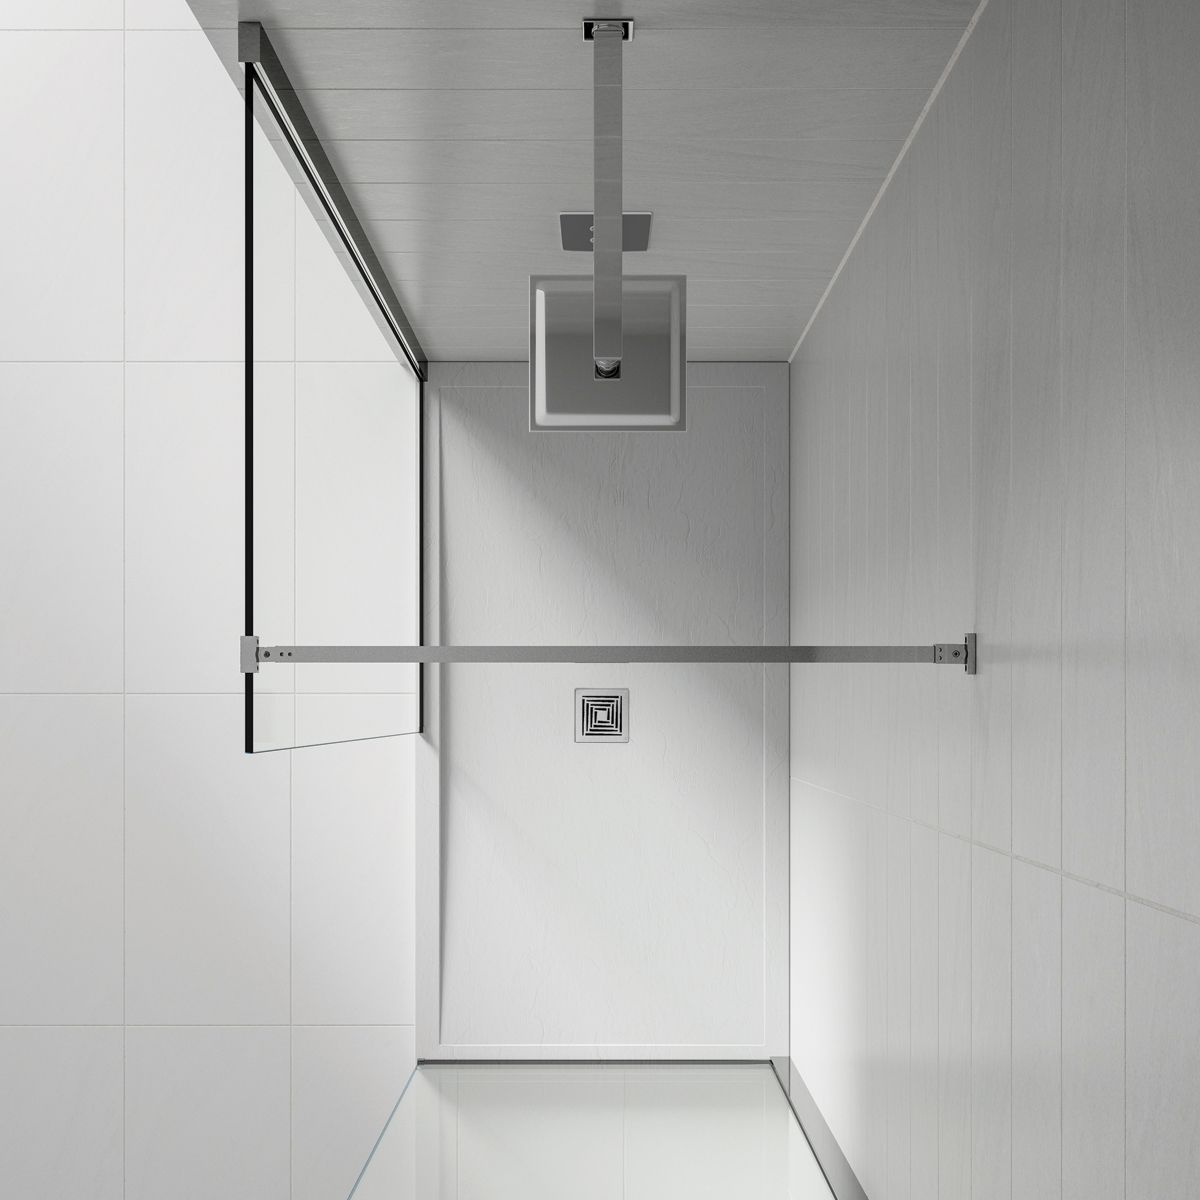 Aquadart White Slate Shower Tray 1200 x 900 Overhead